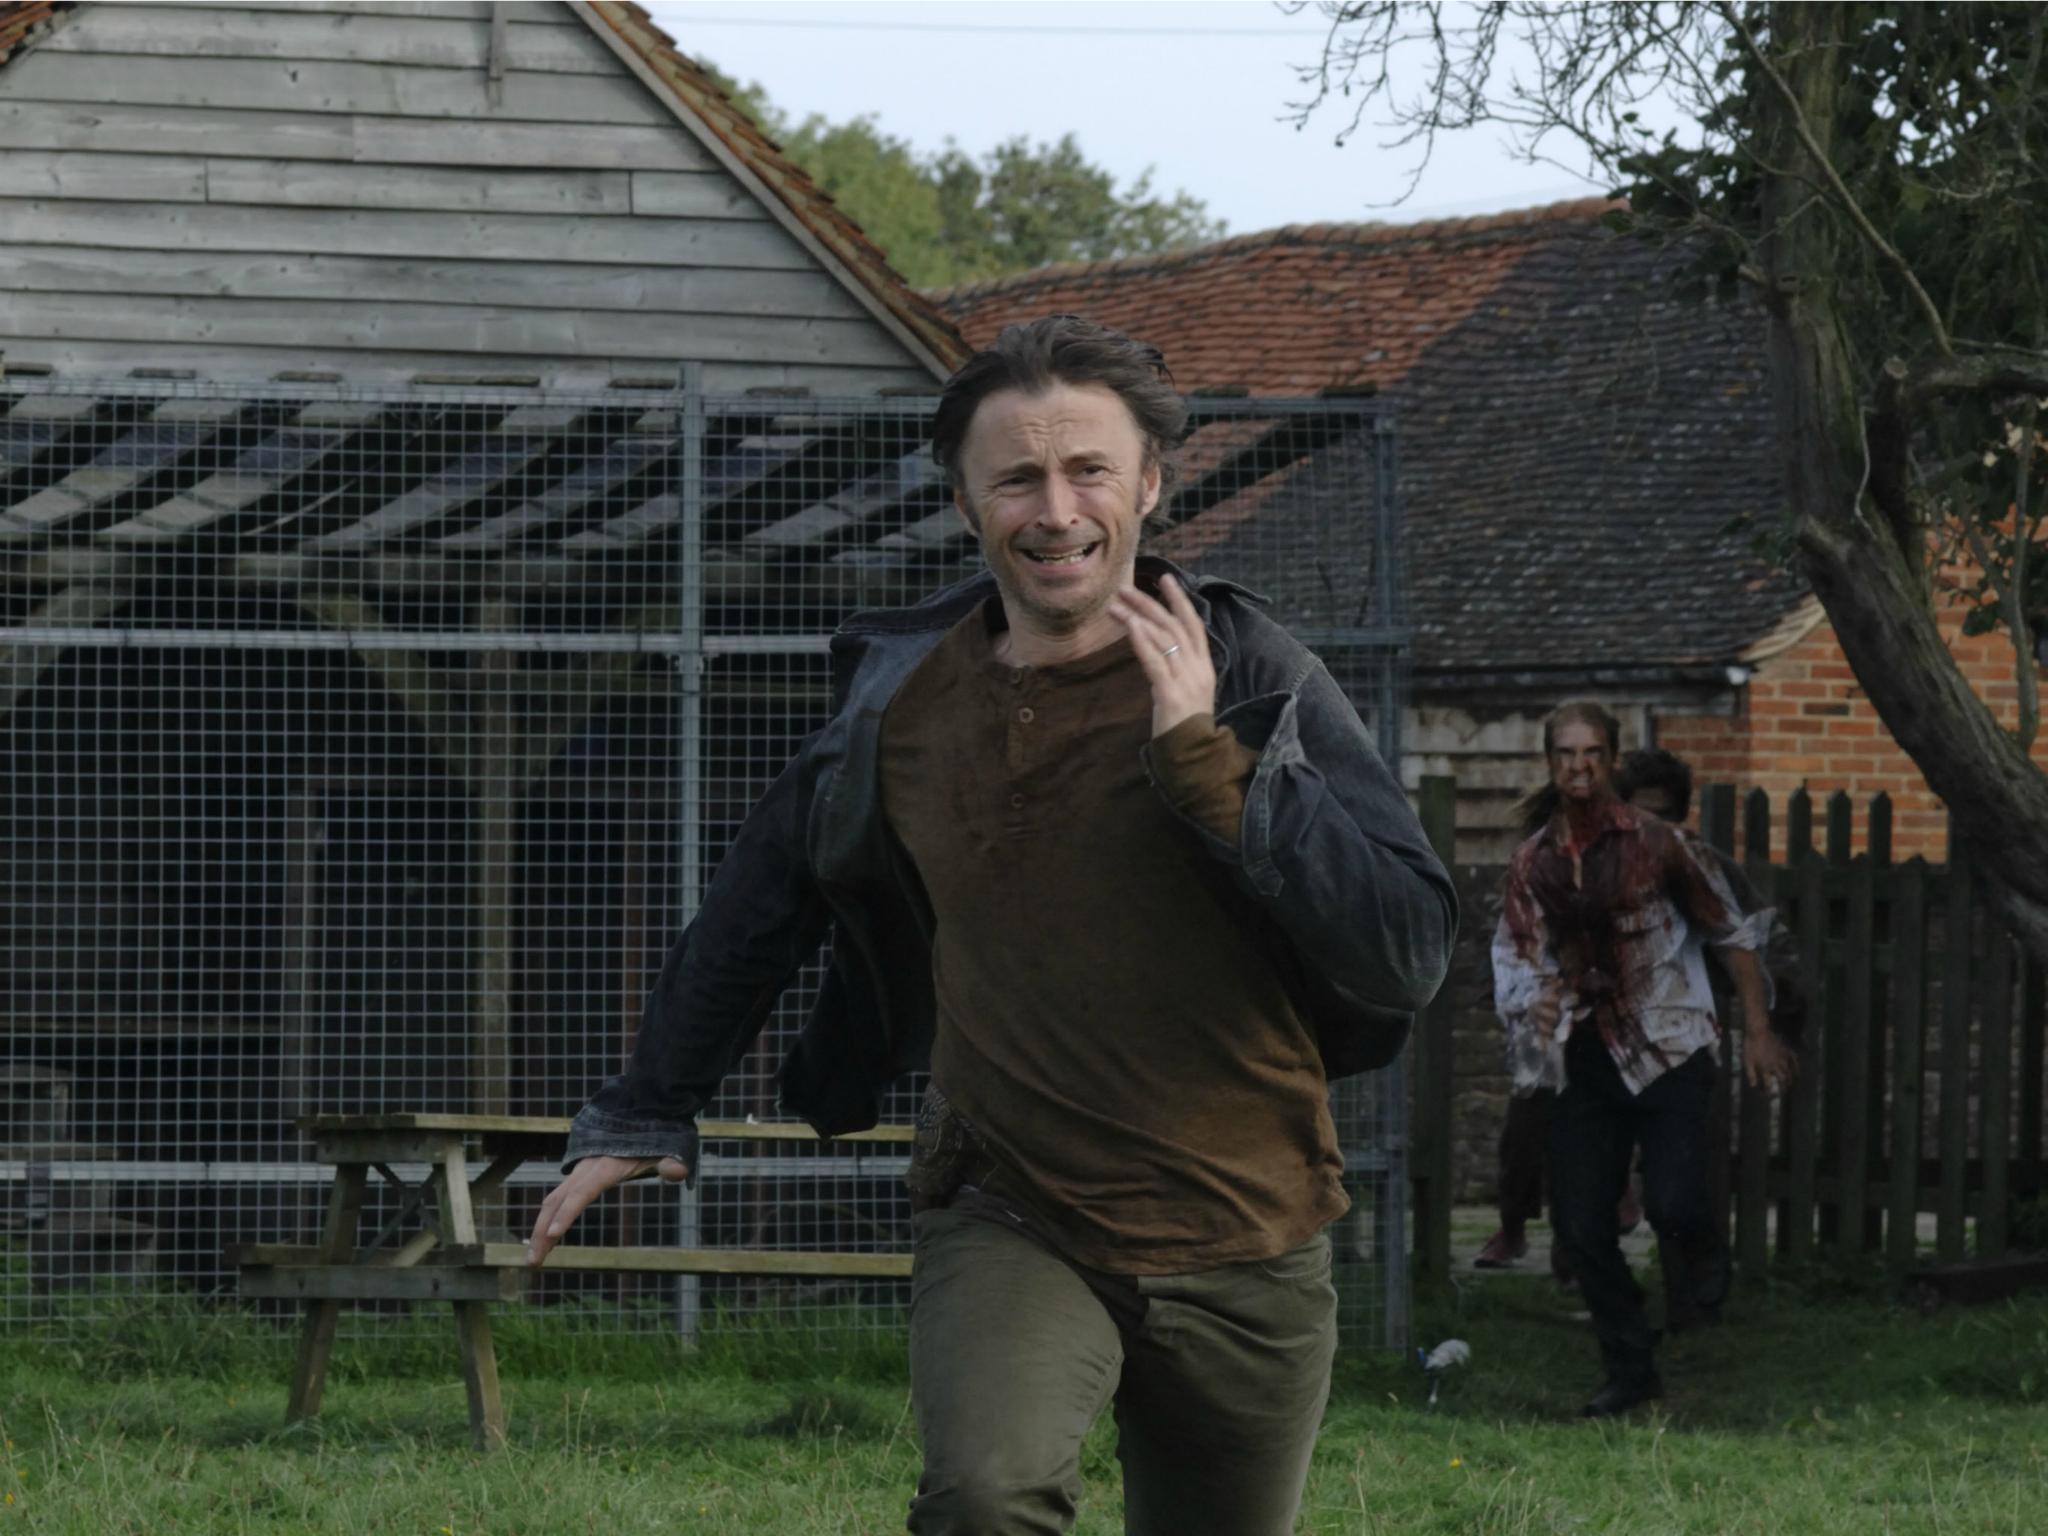 Ten great British villains - 28 Weeks Later..Robert Carlyle as Don.